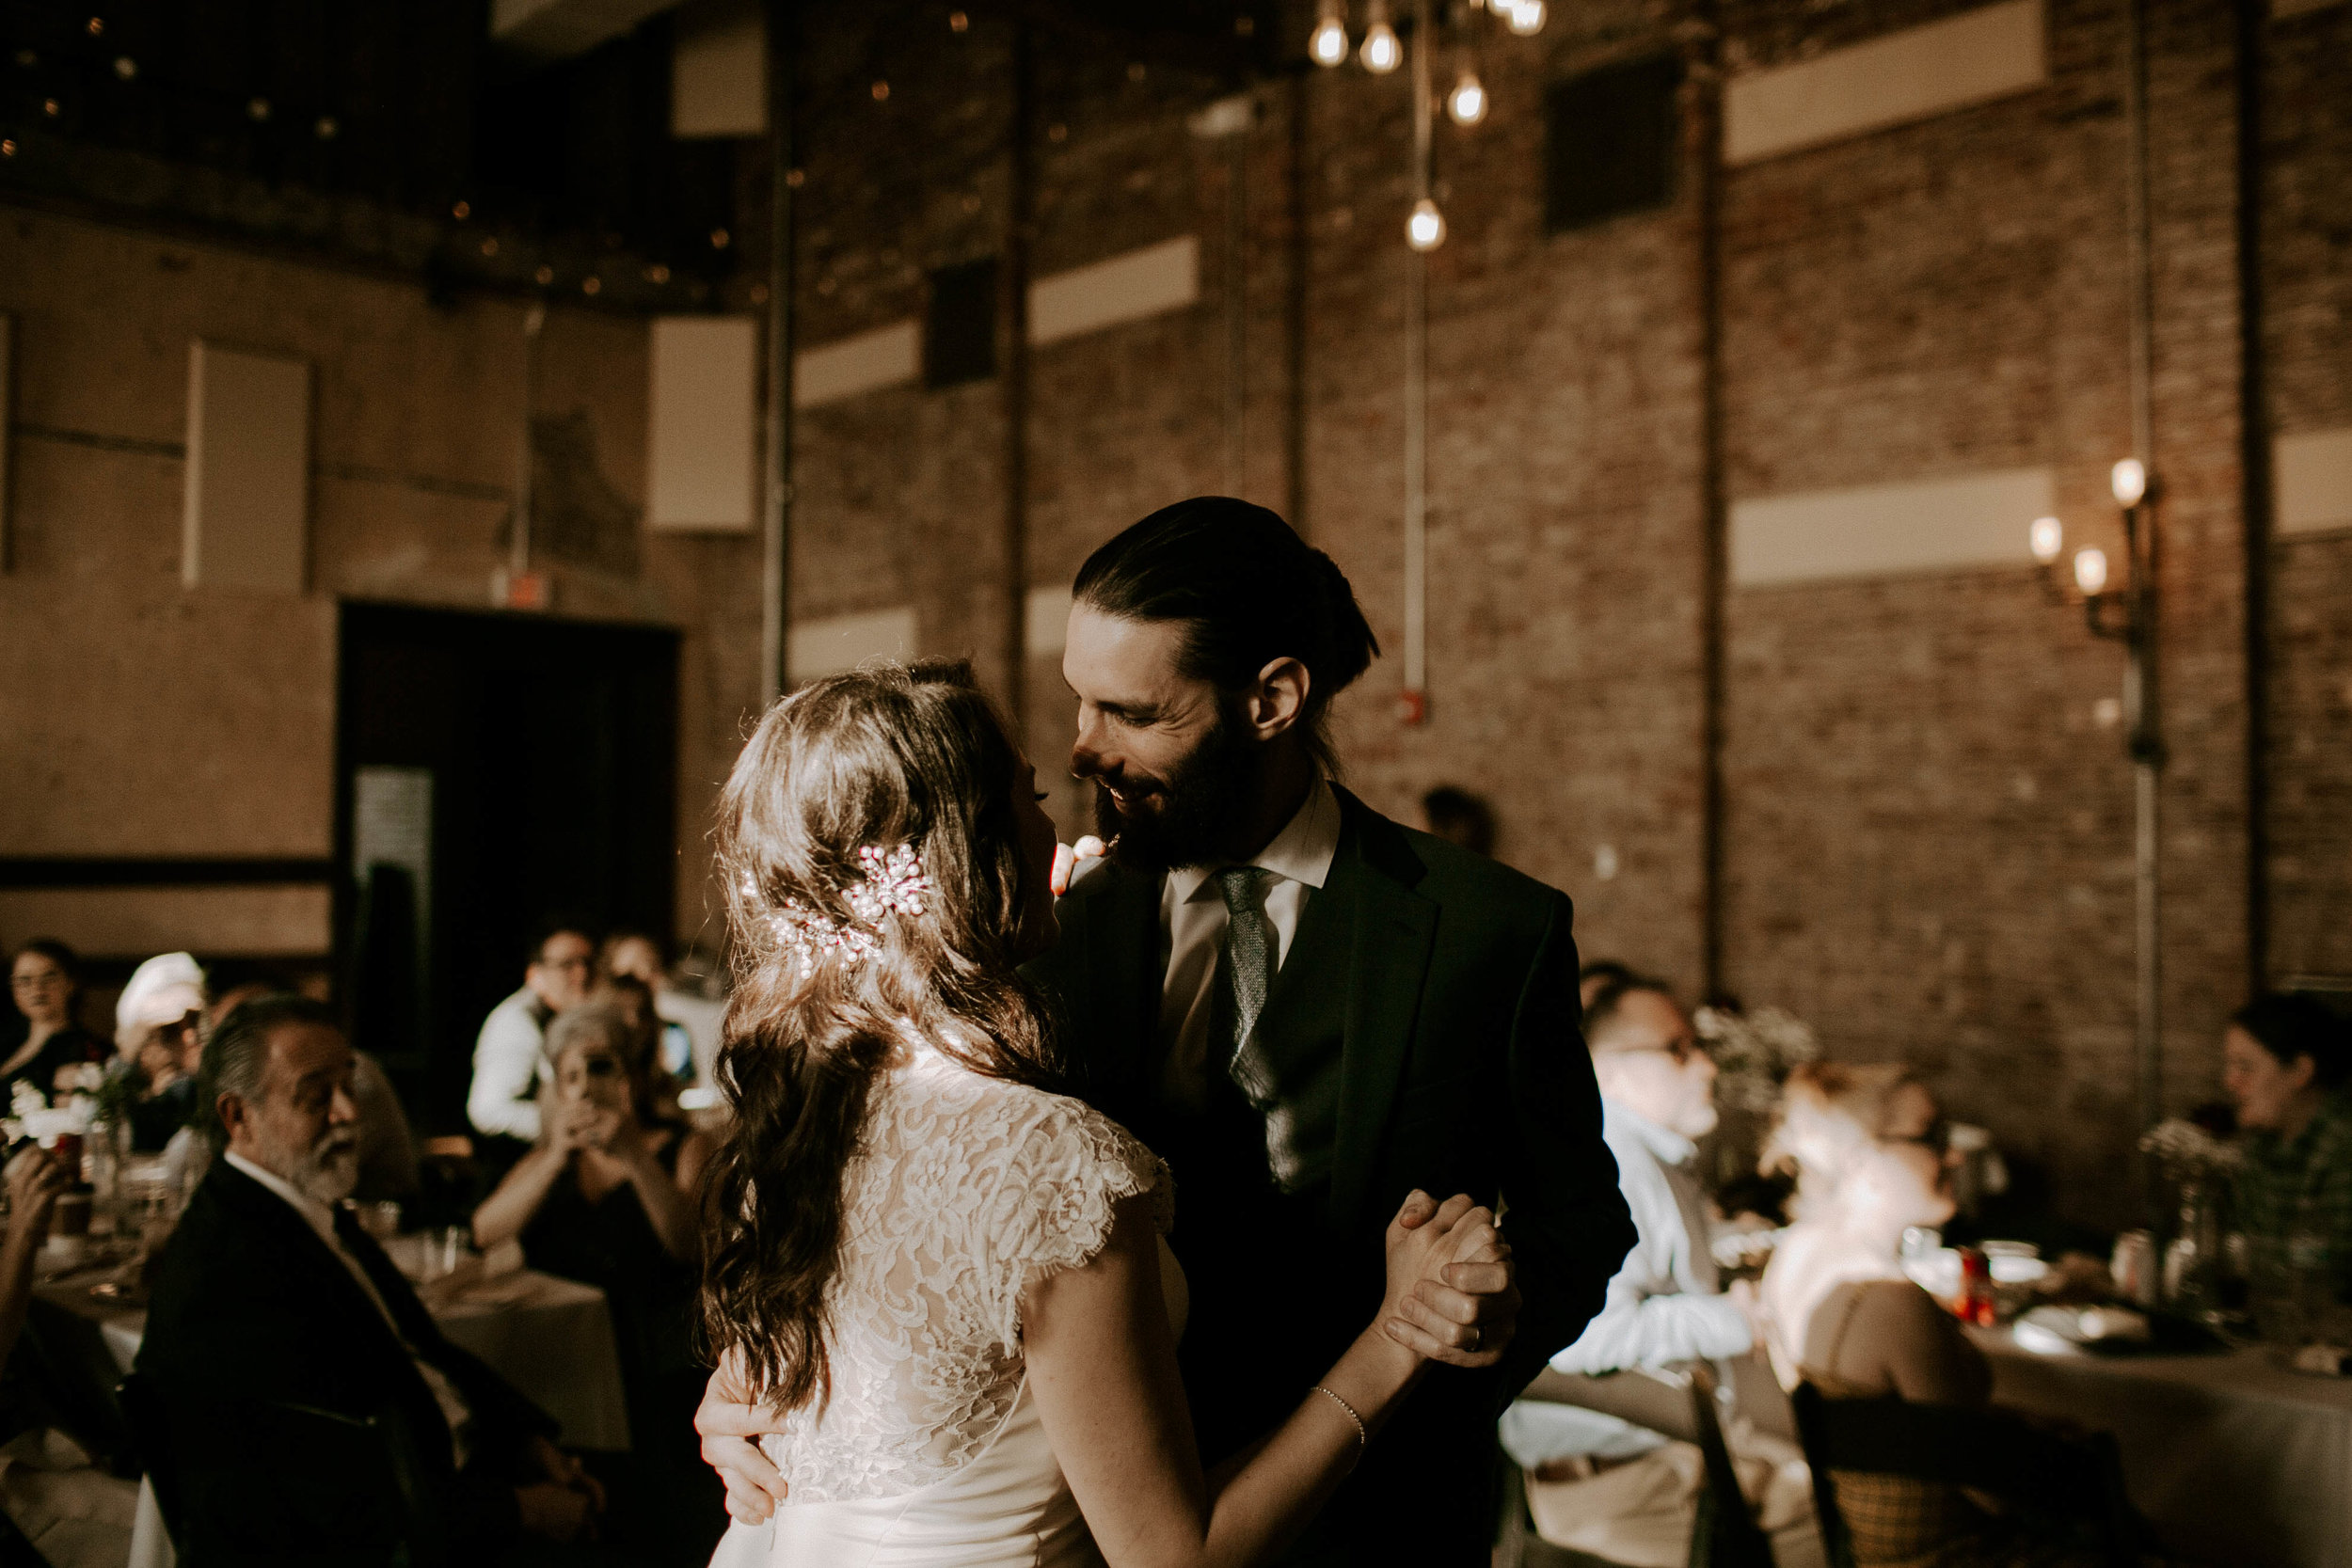 Lindsay+++Josh+_+Indianapolis+Wedding-69.jpg